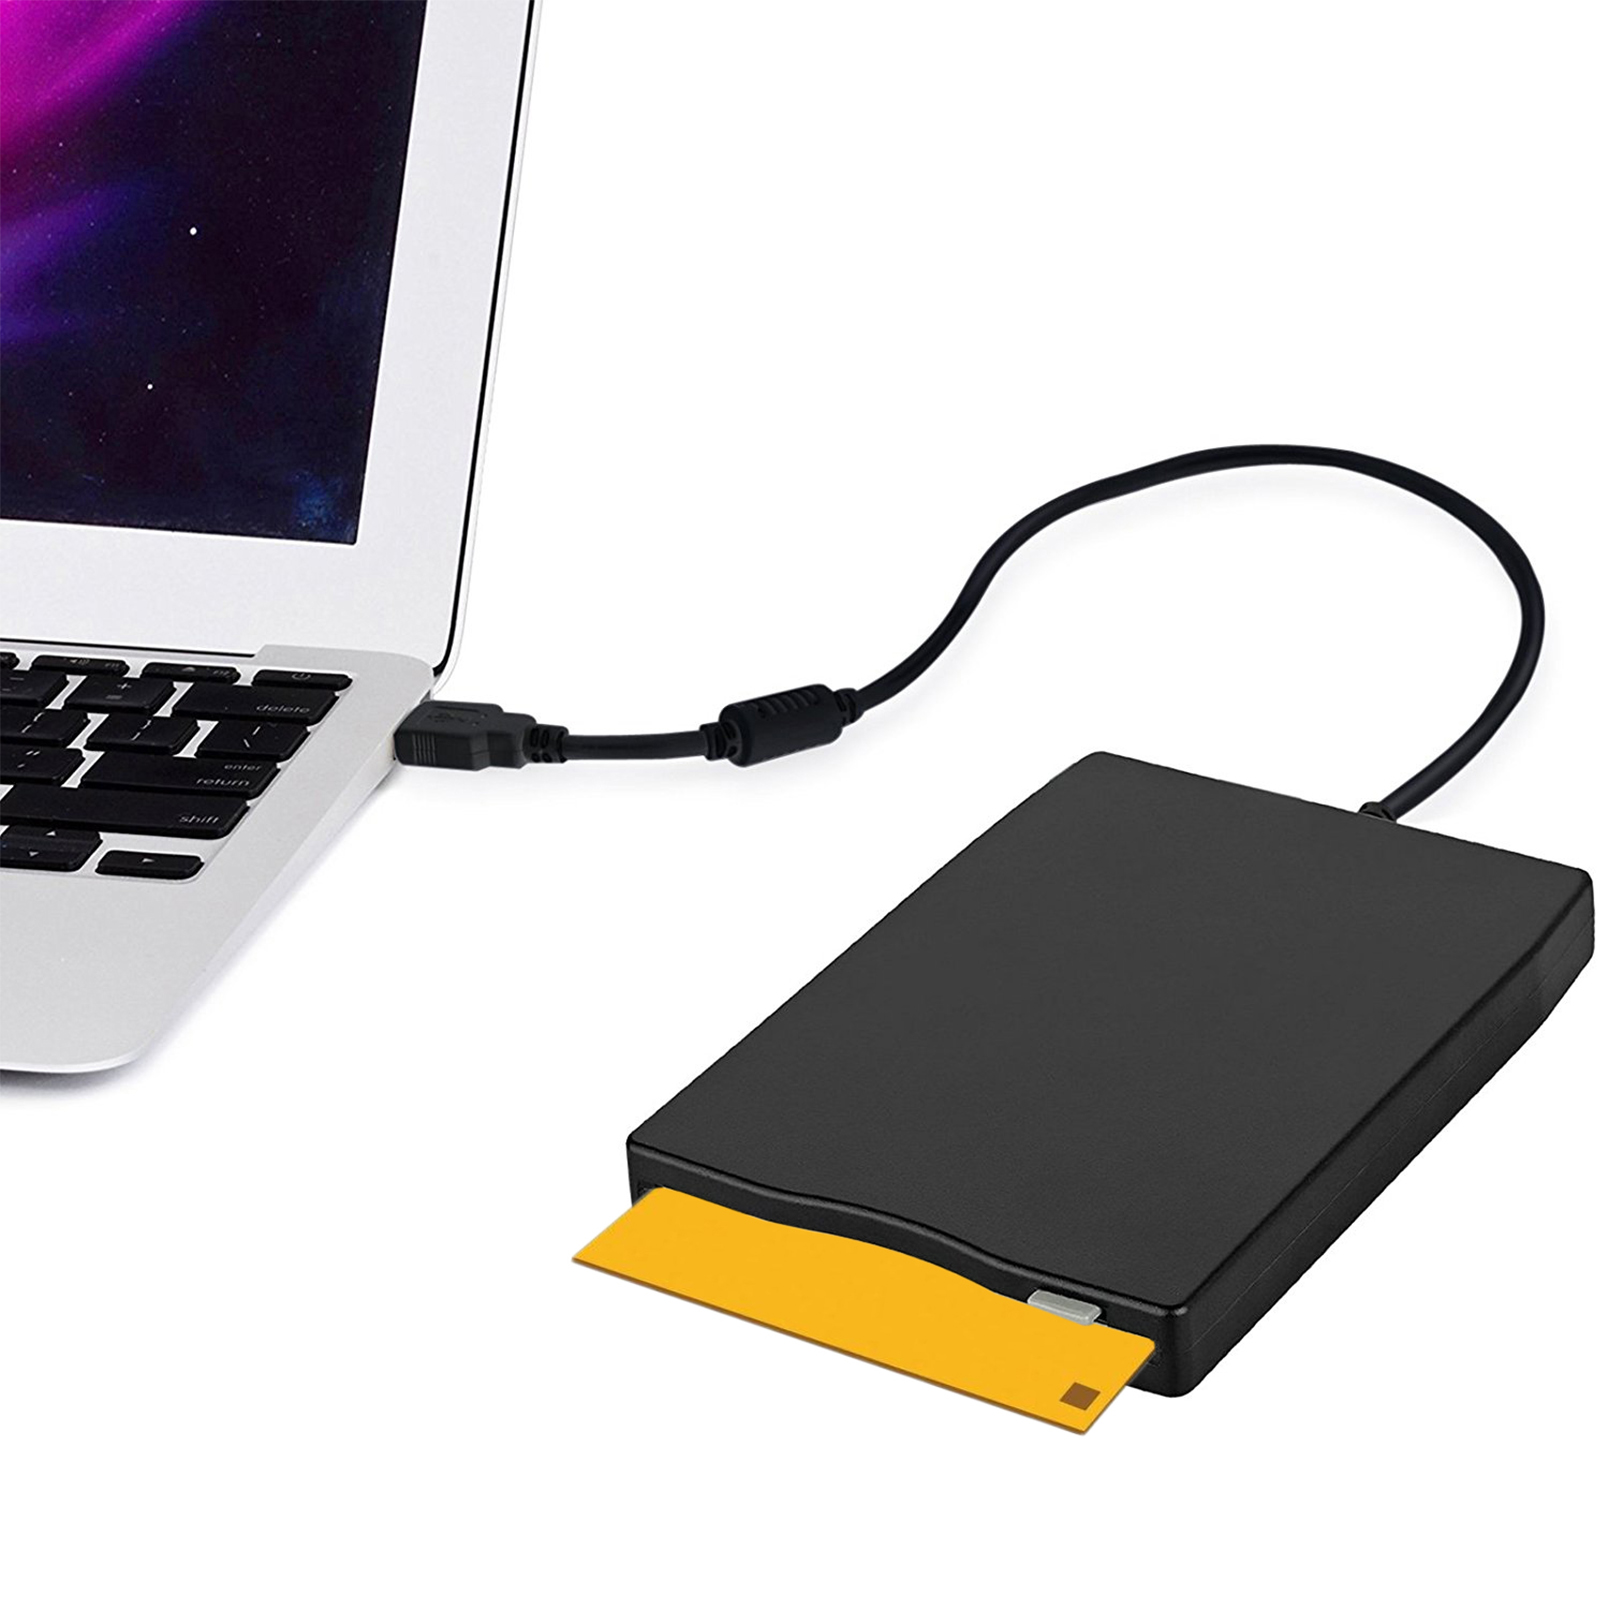 "TSV 3.5"" USB Floppy Disk 1.44 MB FDD Floppy Disk Drive External Portable USB Floppy Disk Reader Plug and Play for Lapt op PC MAC Windows 10 Windows 8 7 VISTA/XP/ME/2000/SE/98"